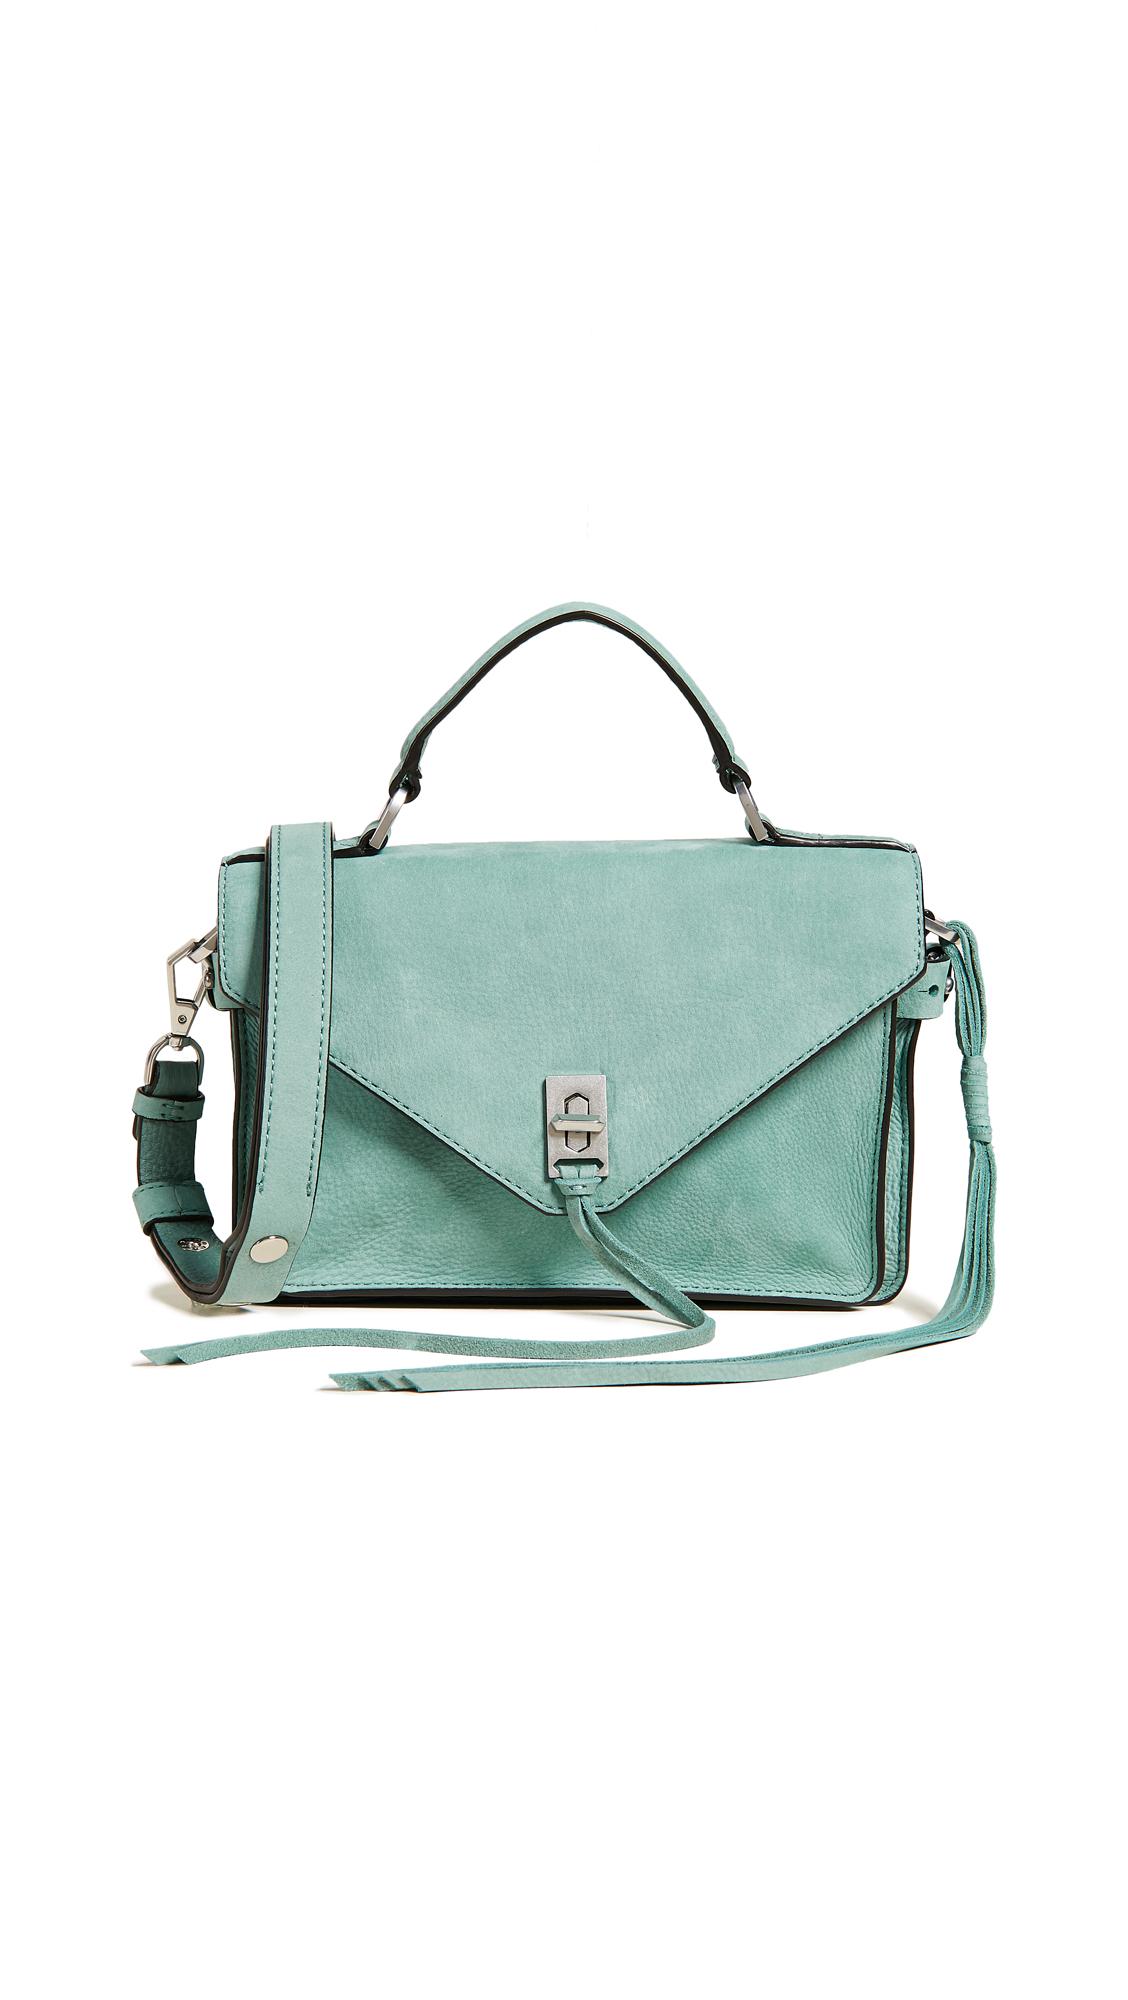 Darren Messenger bag - Green Rebecca Minkoff zte3bEu0q